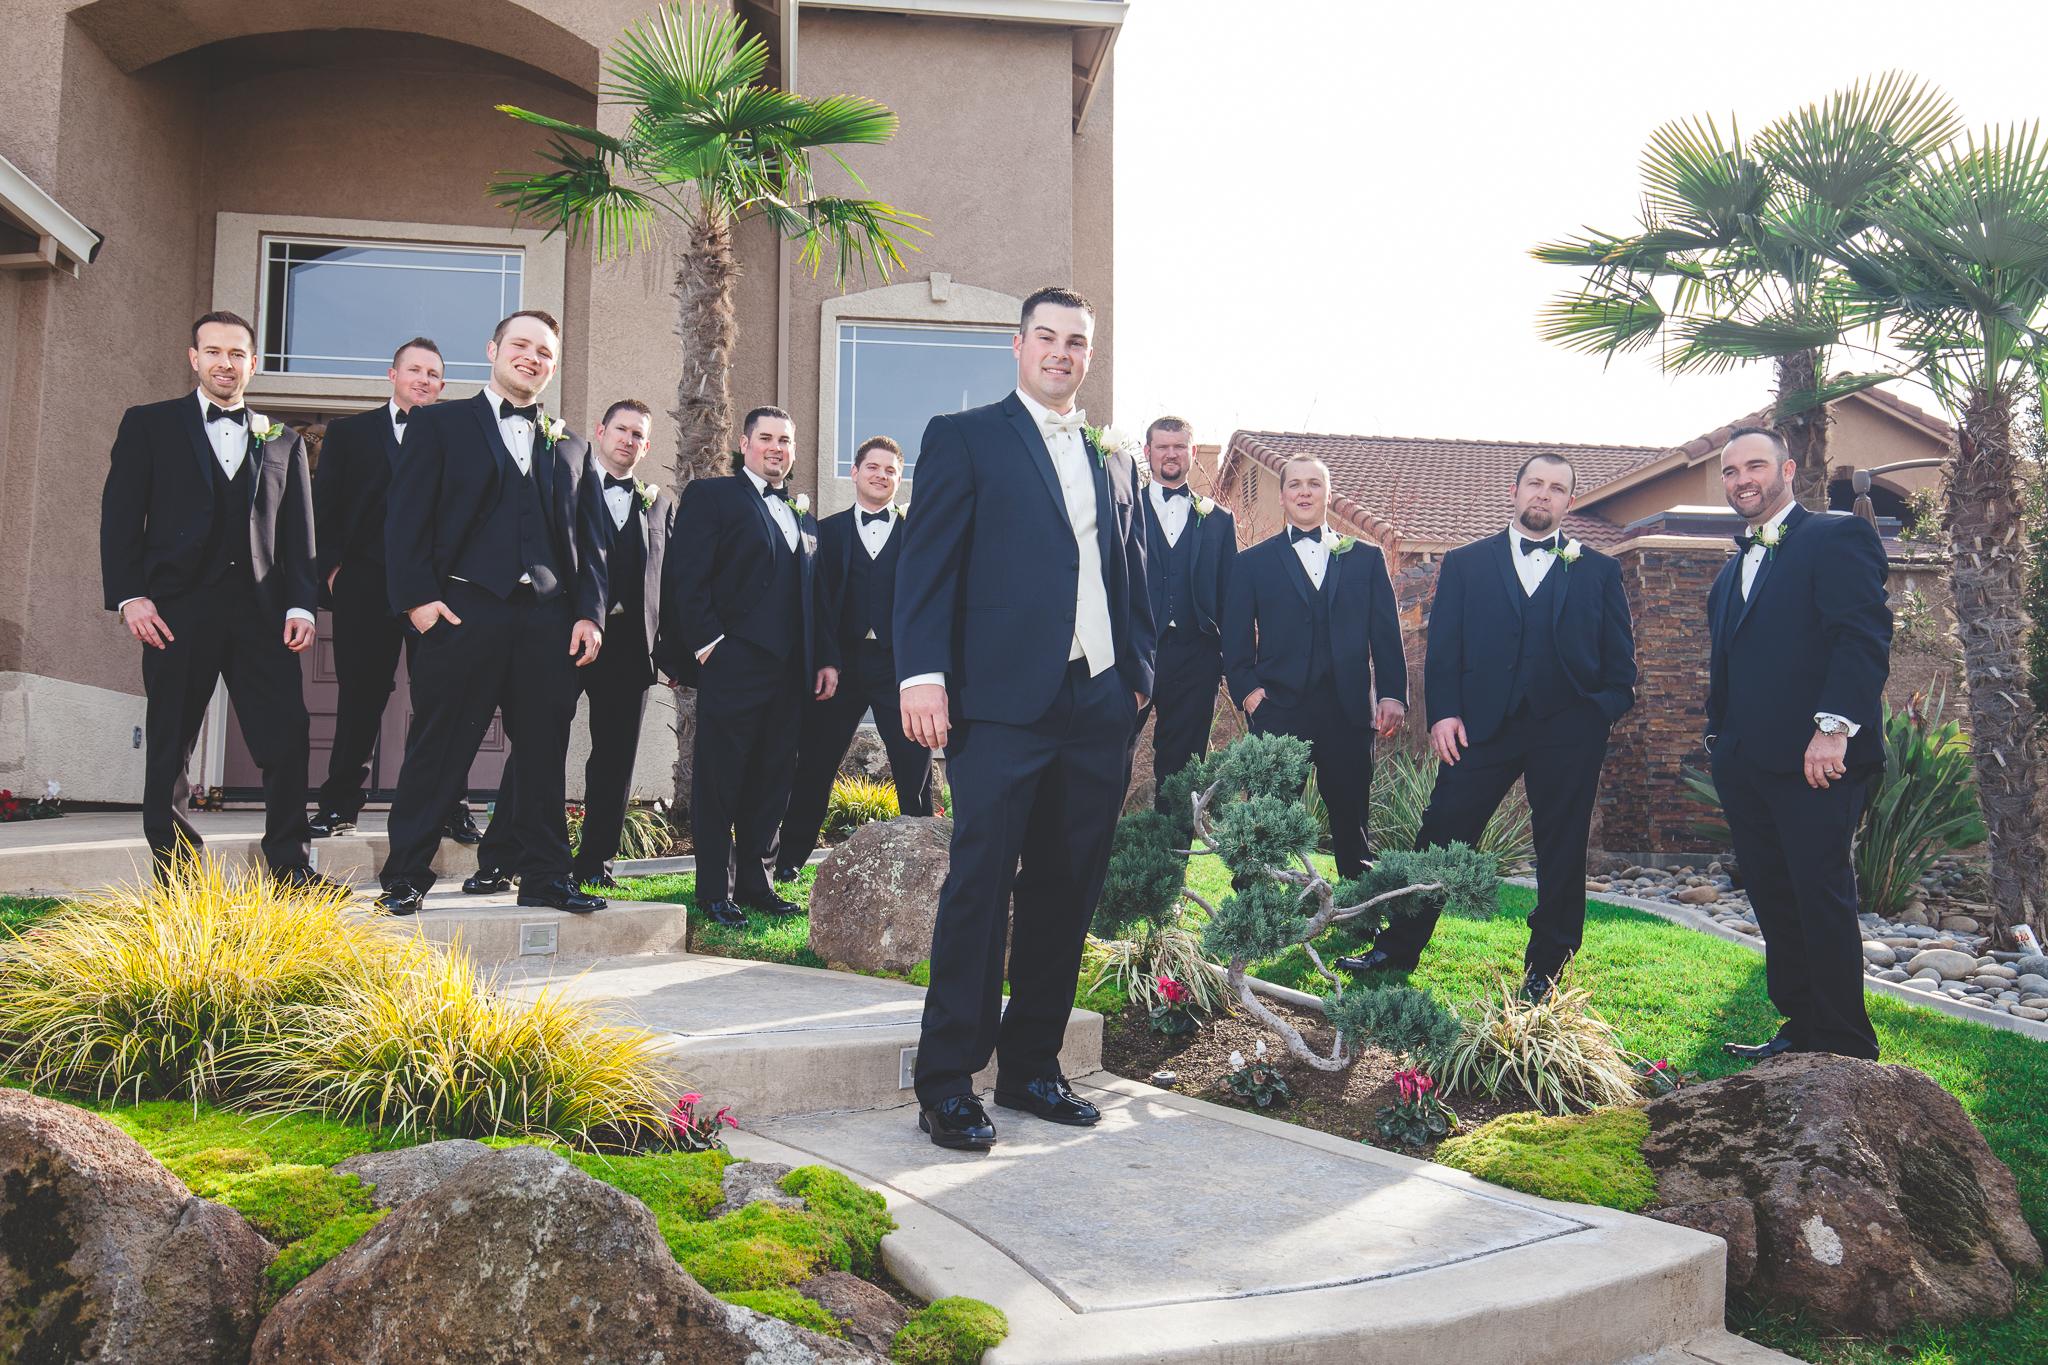 modesto groomsmen